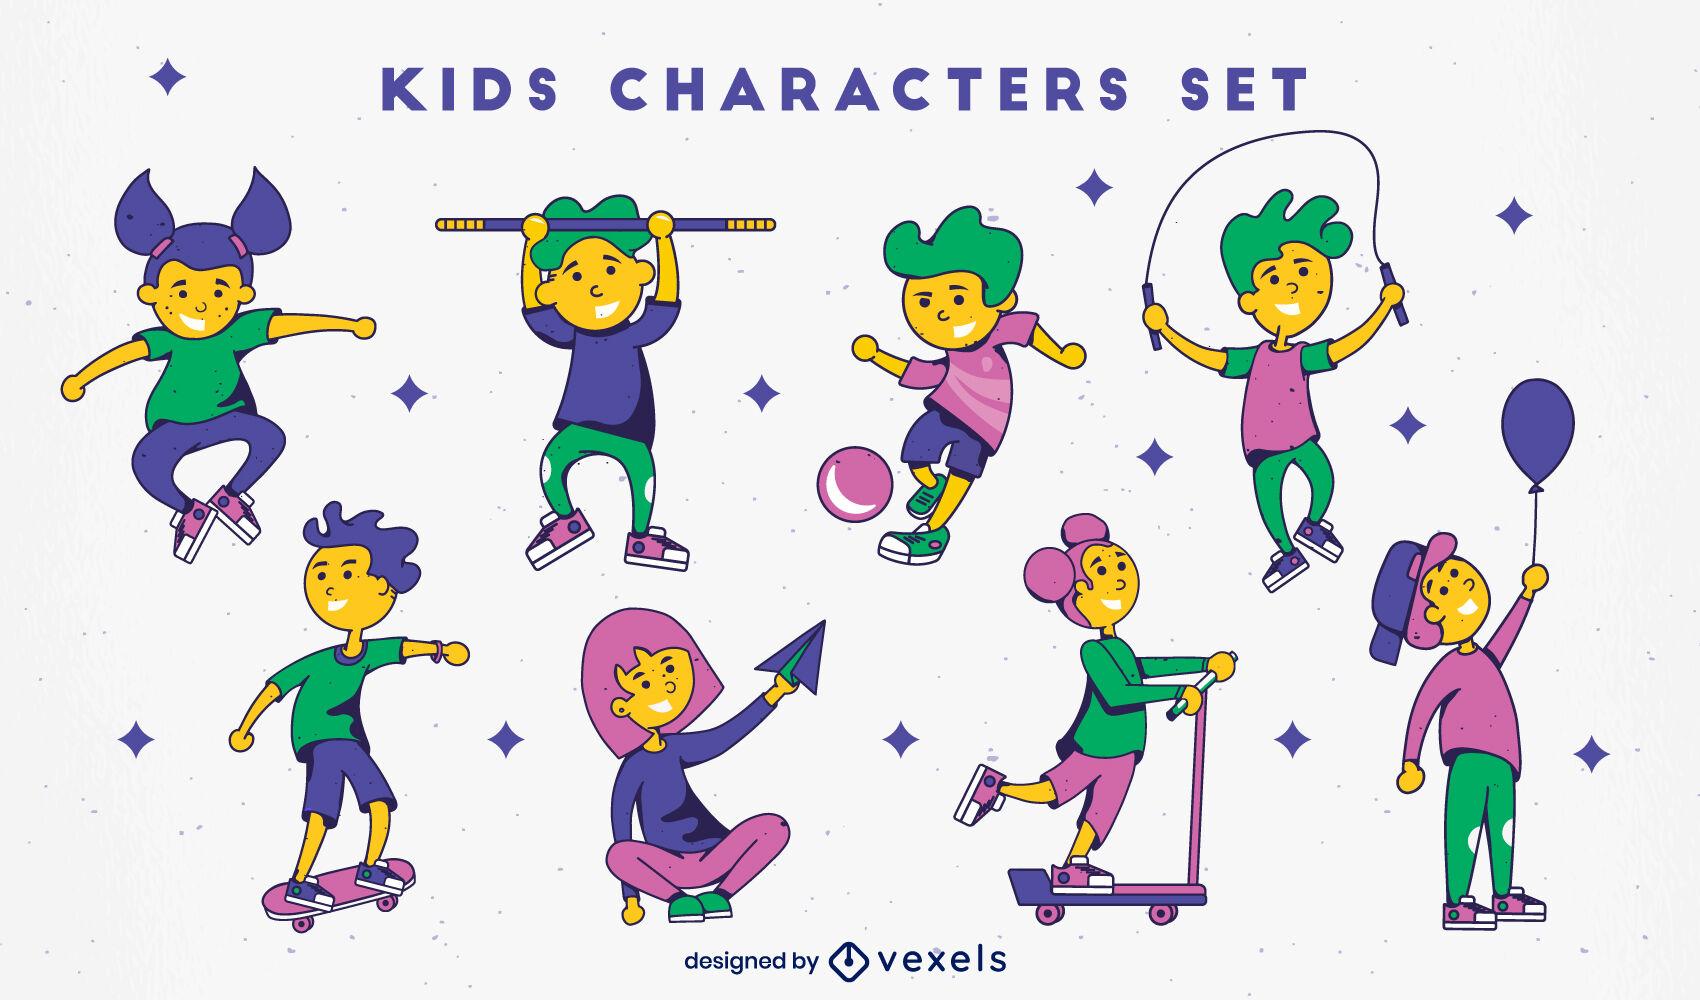 Kids characters color stroke set